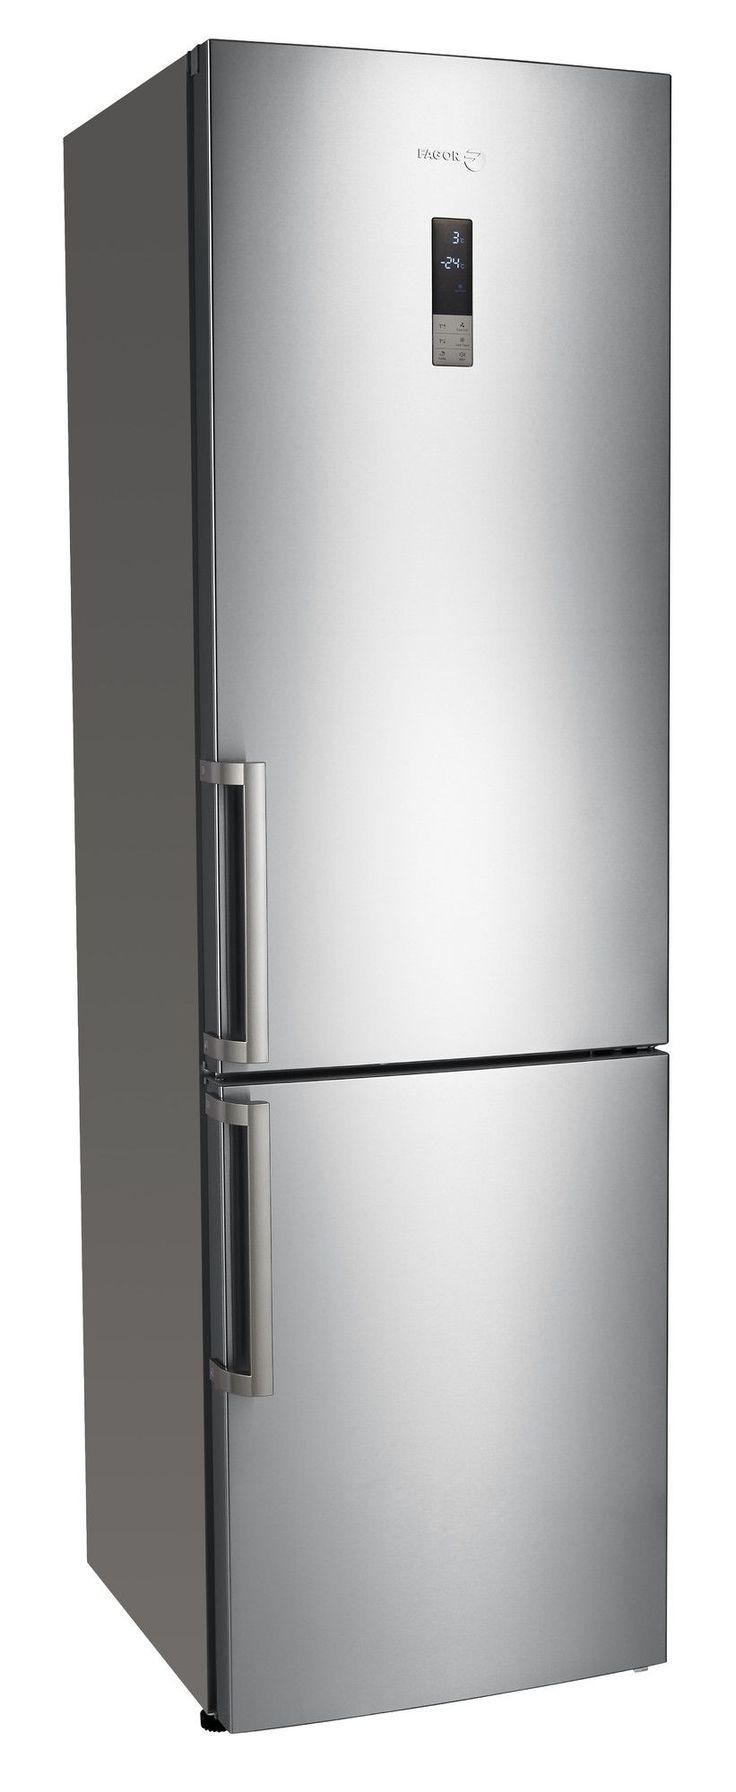 25 best ideas about counter depth refrigerator on. Black Bedroom Furniture Sets. Home Design Ideas